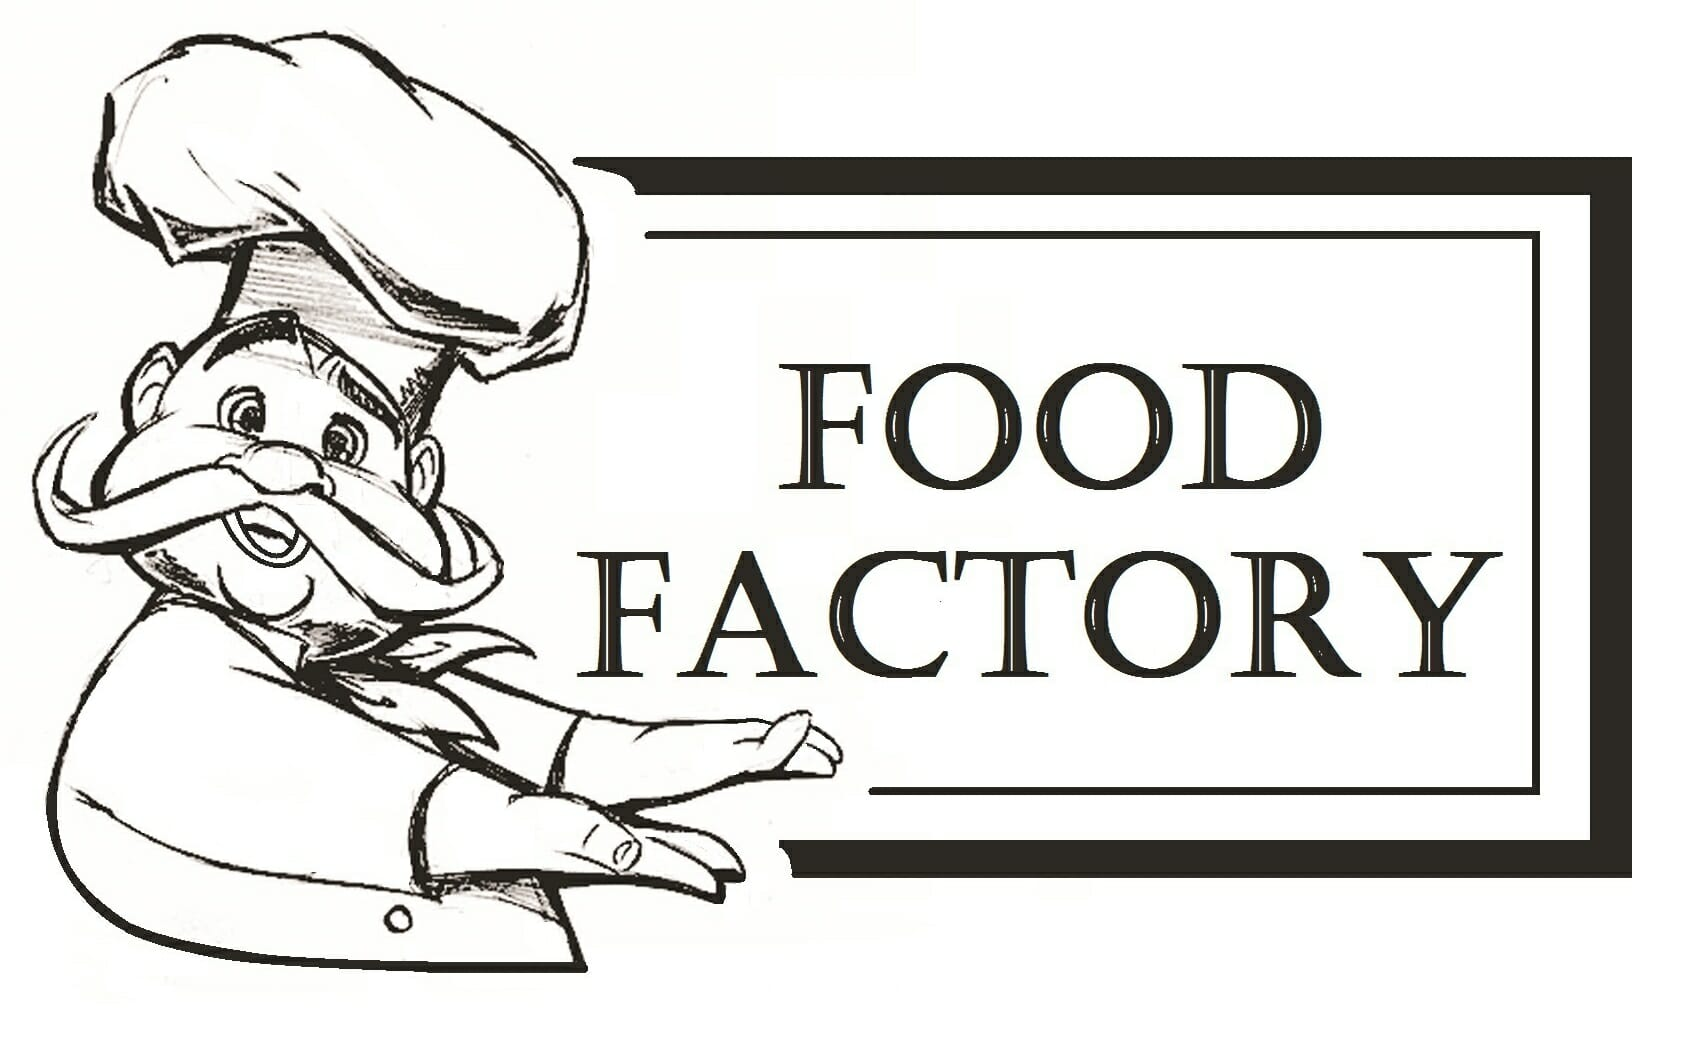 IVV FOOD FACTORY